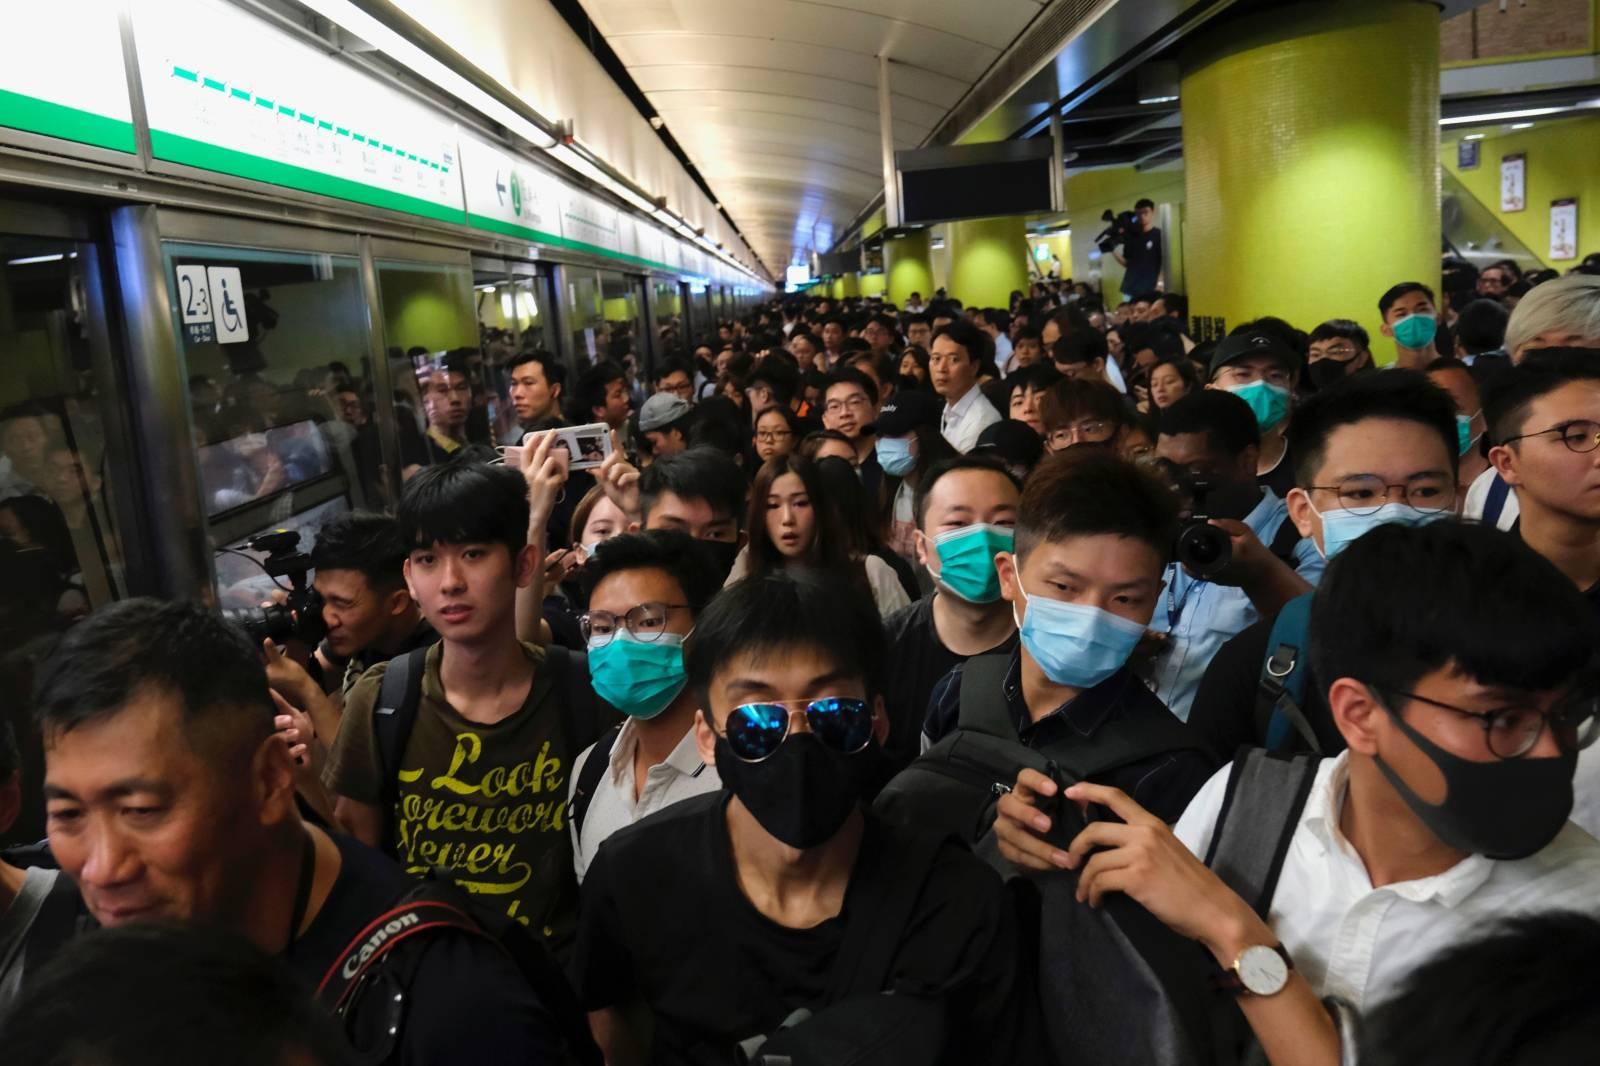 Anti-extradition bill demonstrators block a Mass Transit Railway (MTR) train in Hong Kong